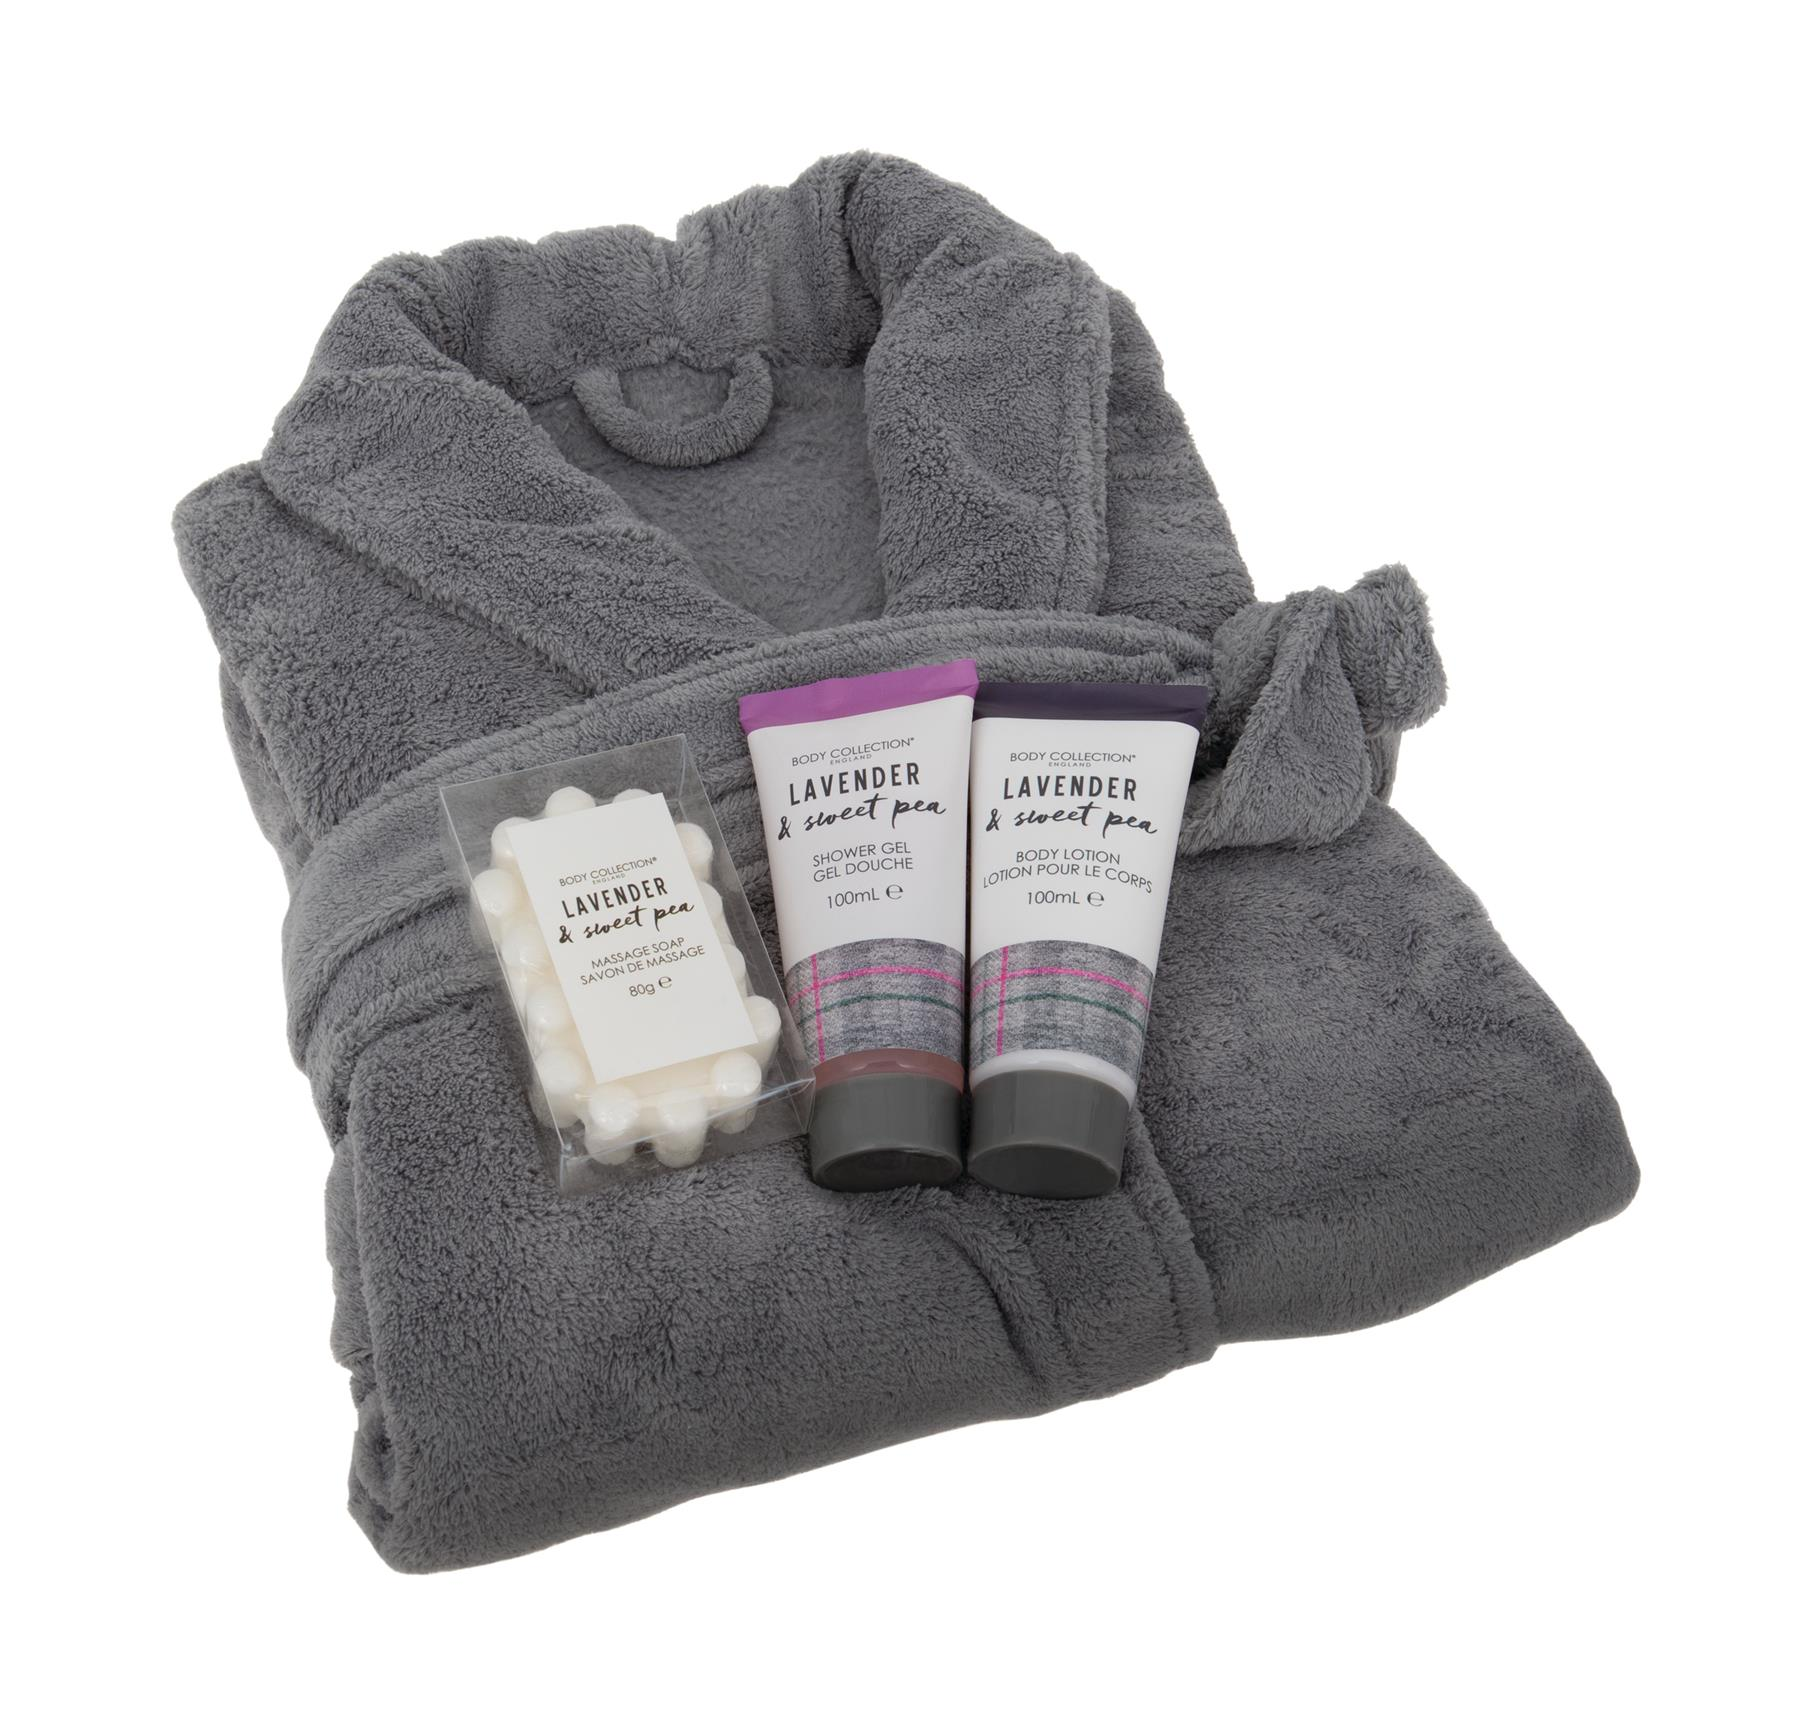 Body-Collection-Ladies-Toiletry-Bath-amp-Body-Gift-Sets-for-Women-Xmas-Birthday thumbnail 6